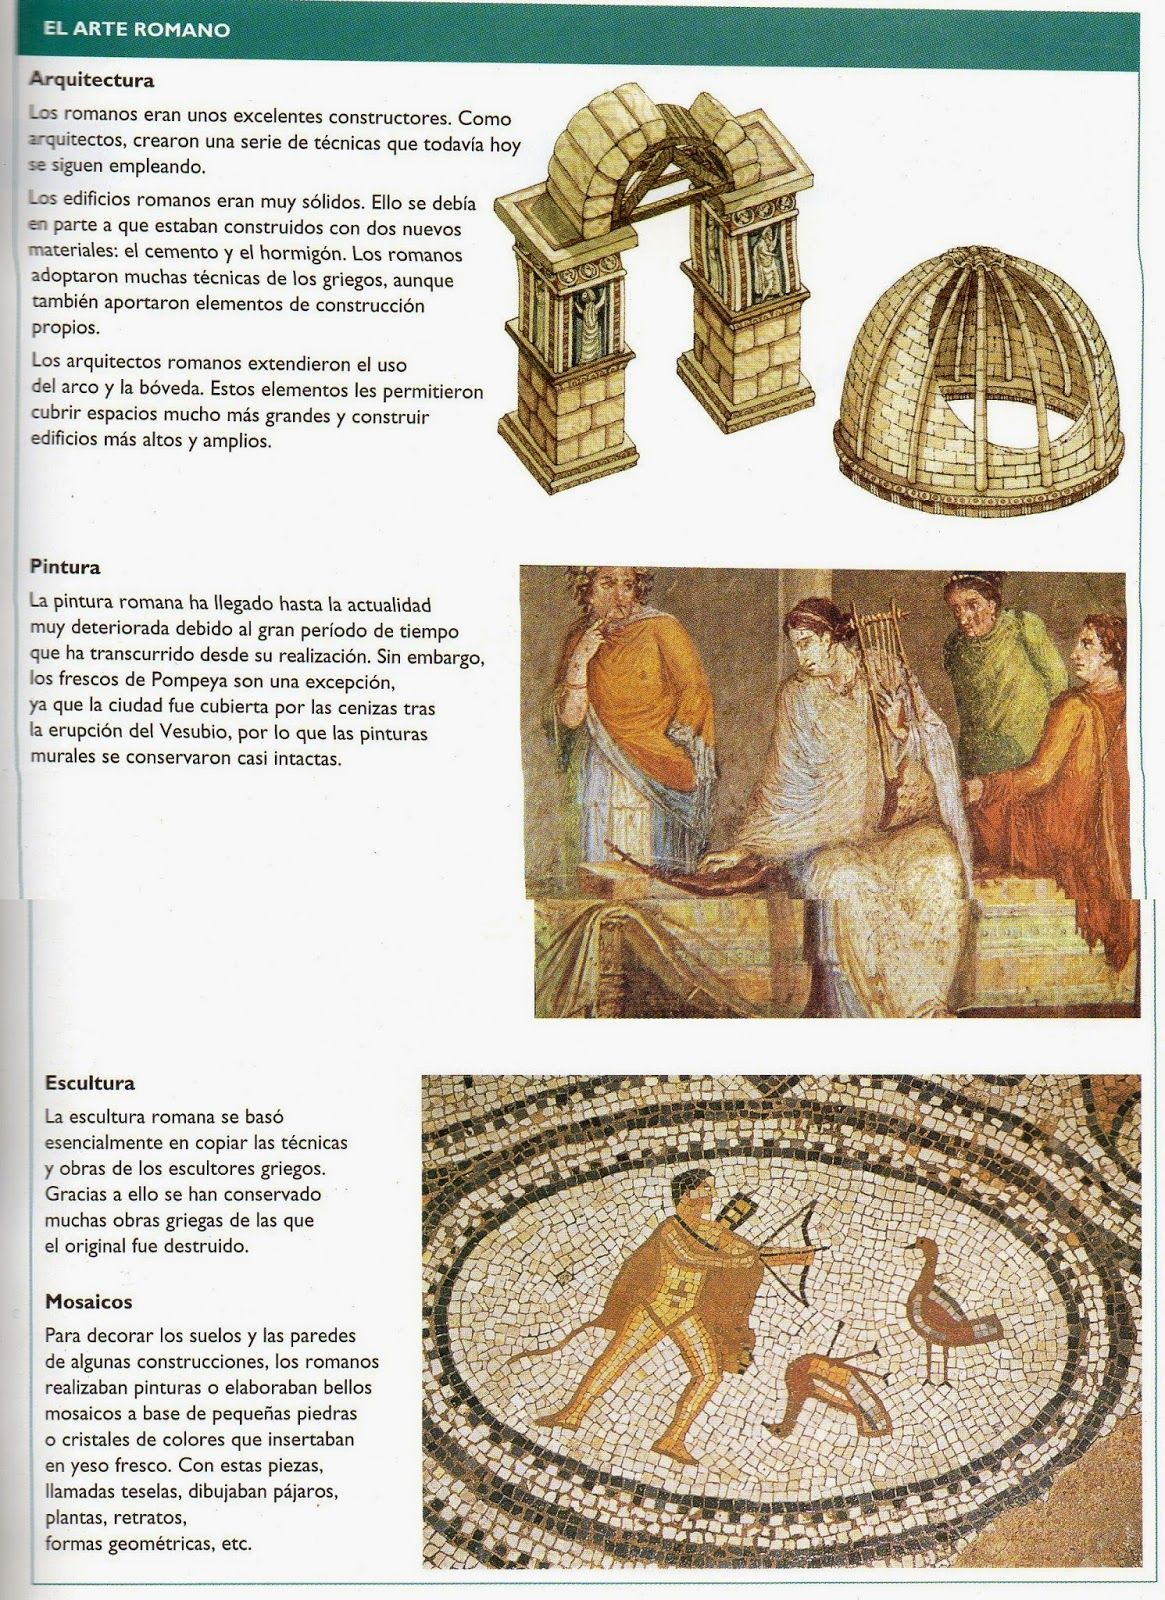 ROMA ANTIGUA: APORTES A LA HUMANIDAD   Roma antigua.   Pinterest ...